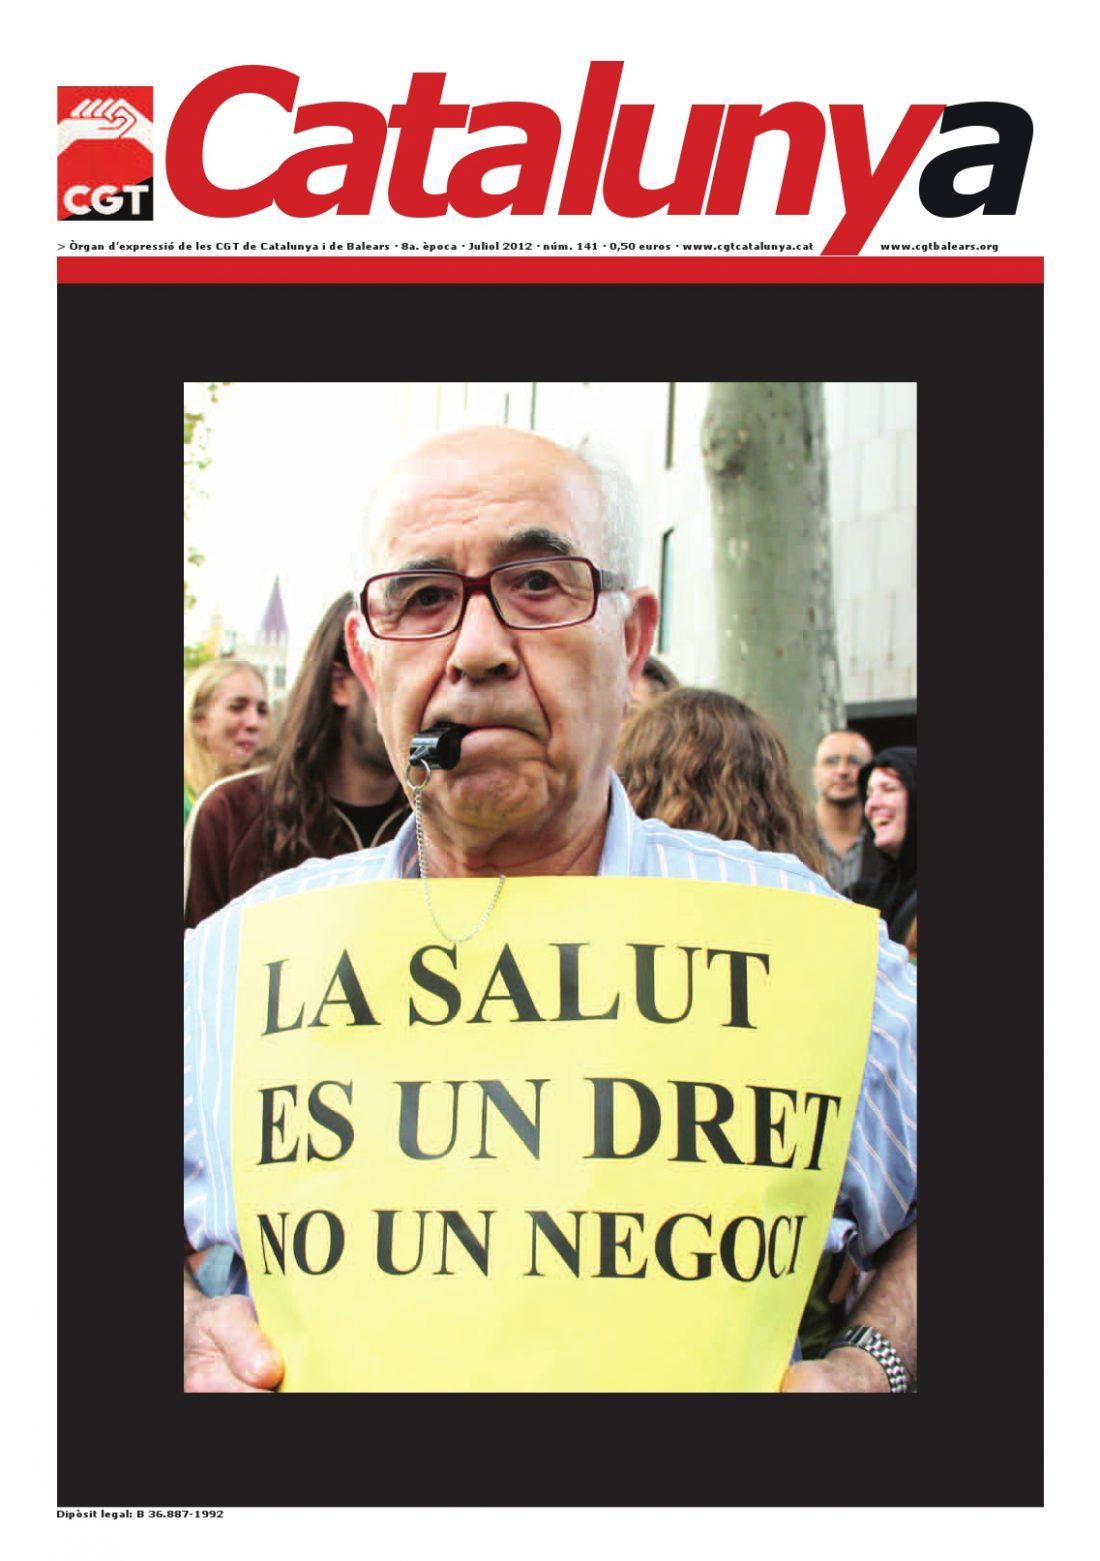 Catalunya núm. 141 – julio 2012